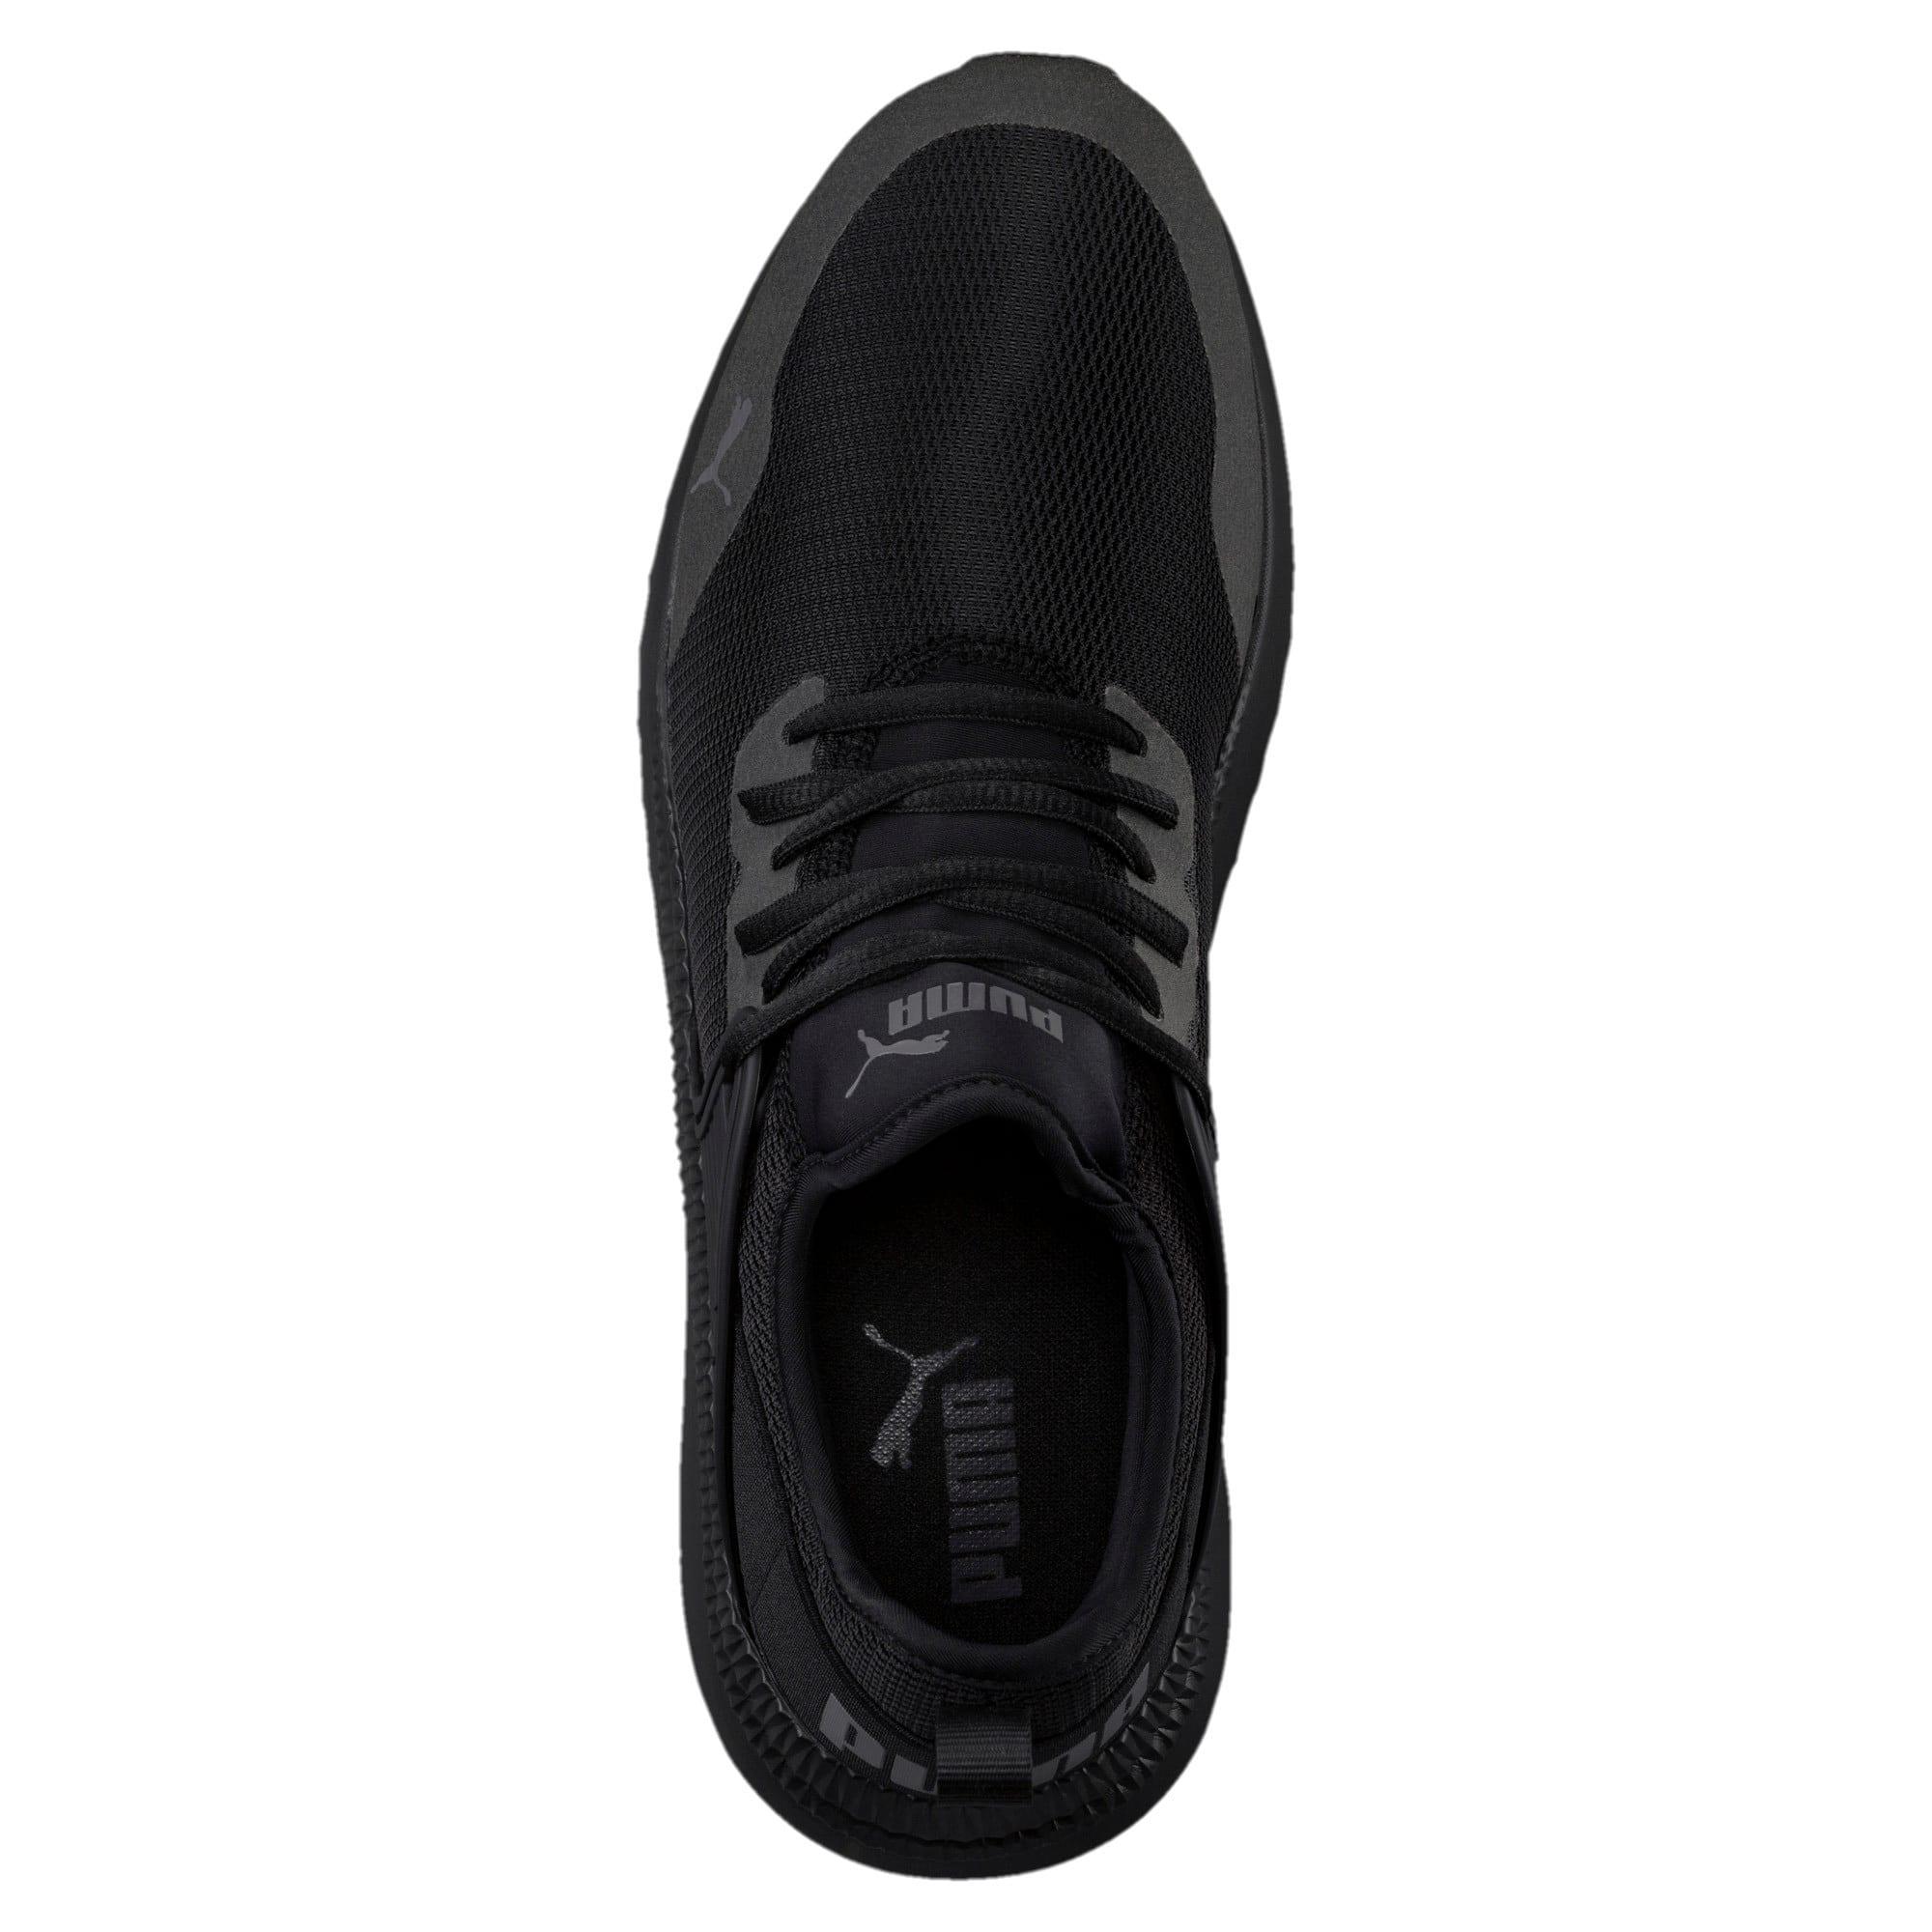 Thumbnail 5 of Pacer Next Cage Sneakers, Puma Black-Puma Black, medium